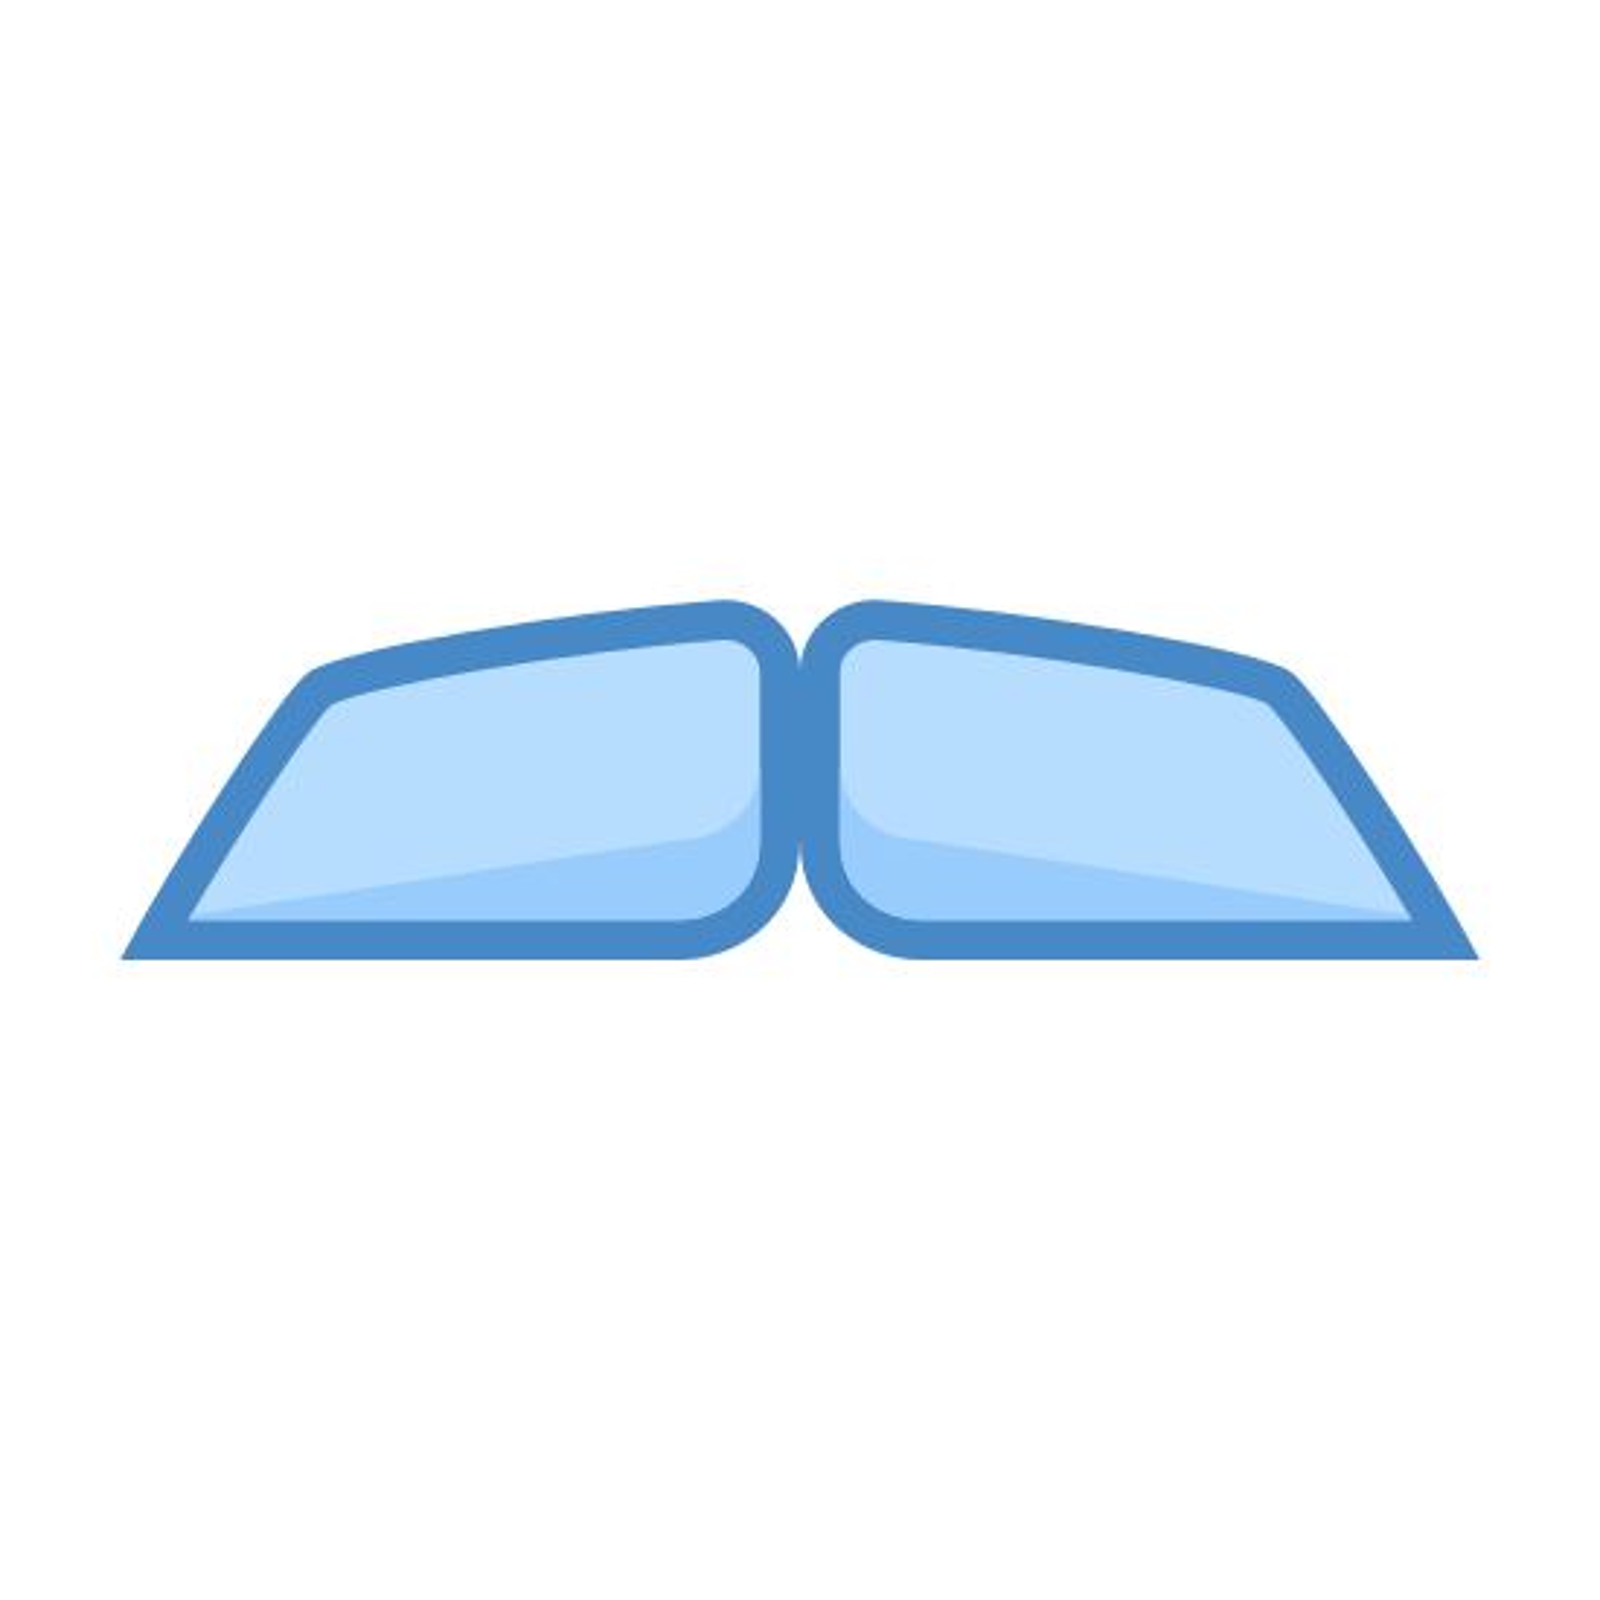 Lampshade Mustache icon